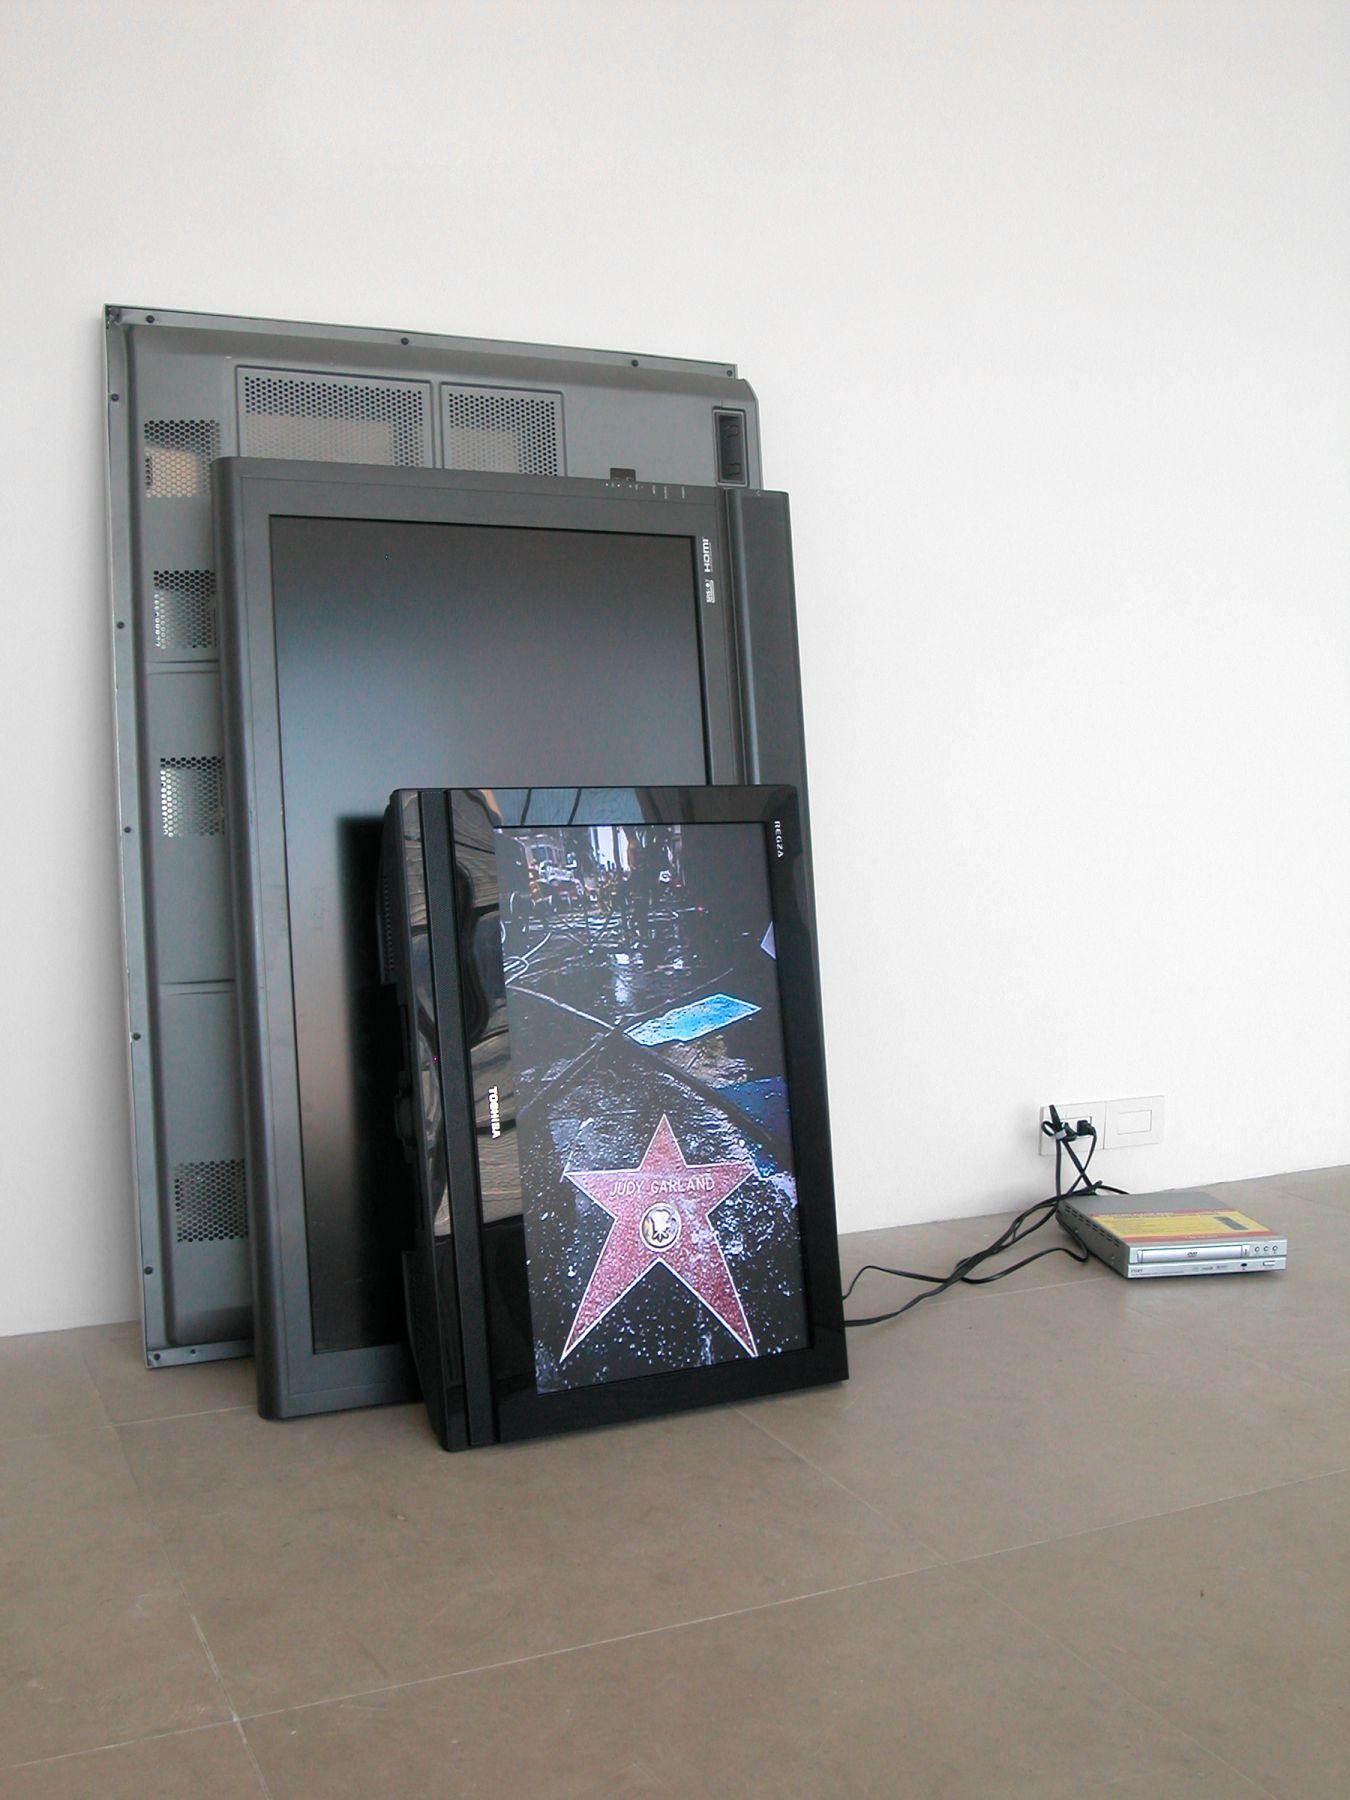 Bernadette Corporation, Pedestrian Cinema, 2008, 3 flat screen monitors, found image, dvd player